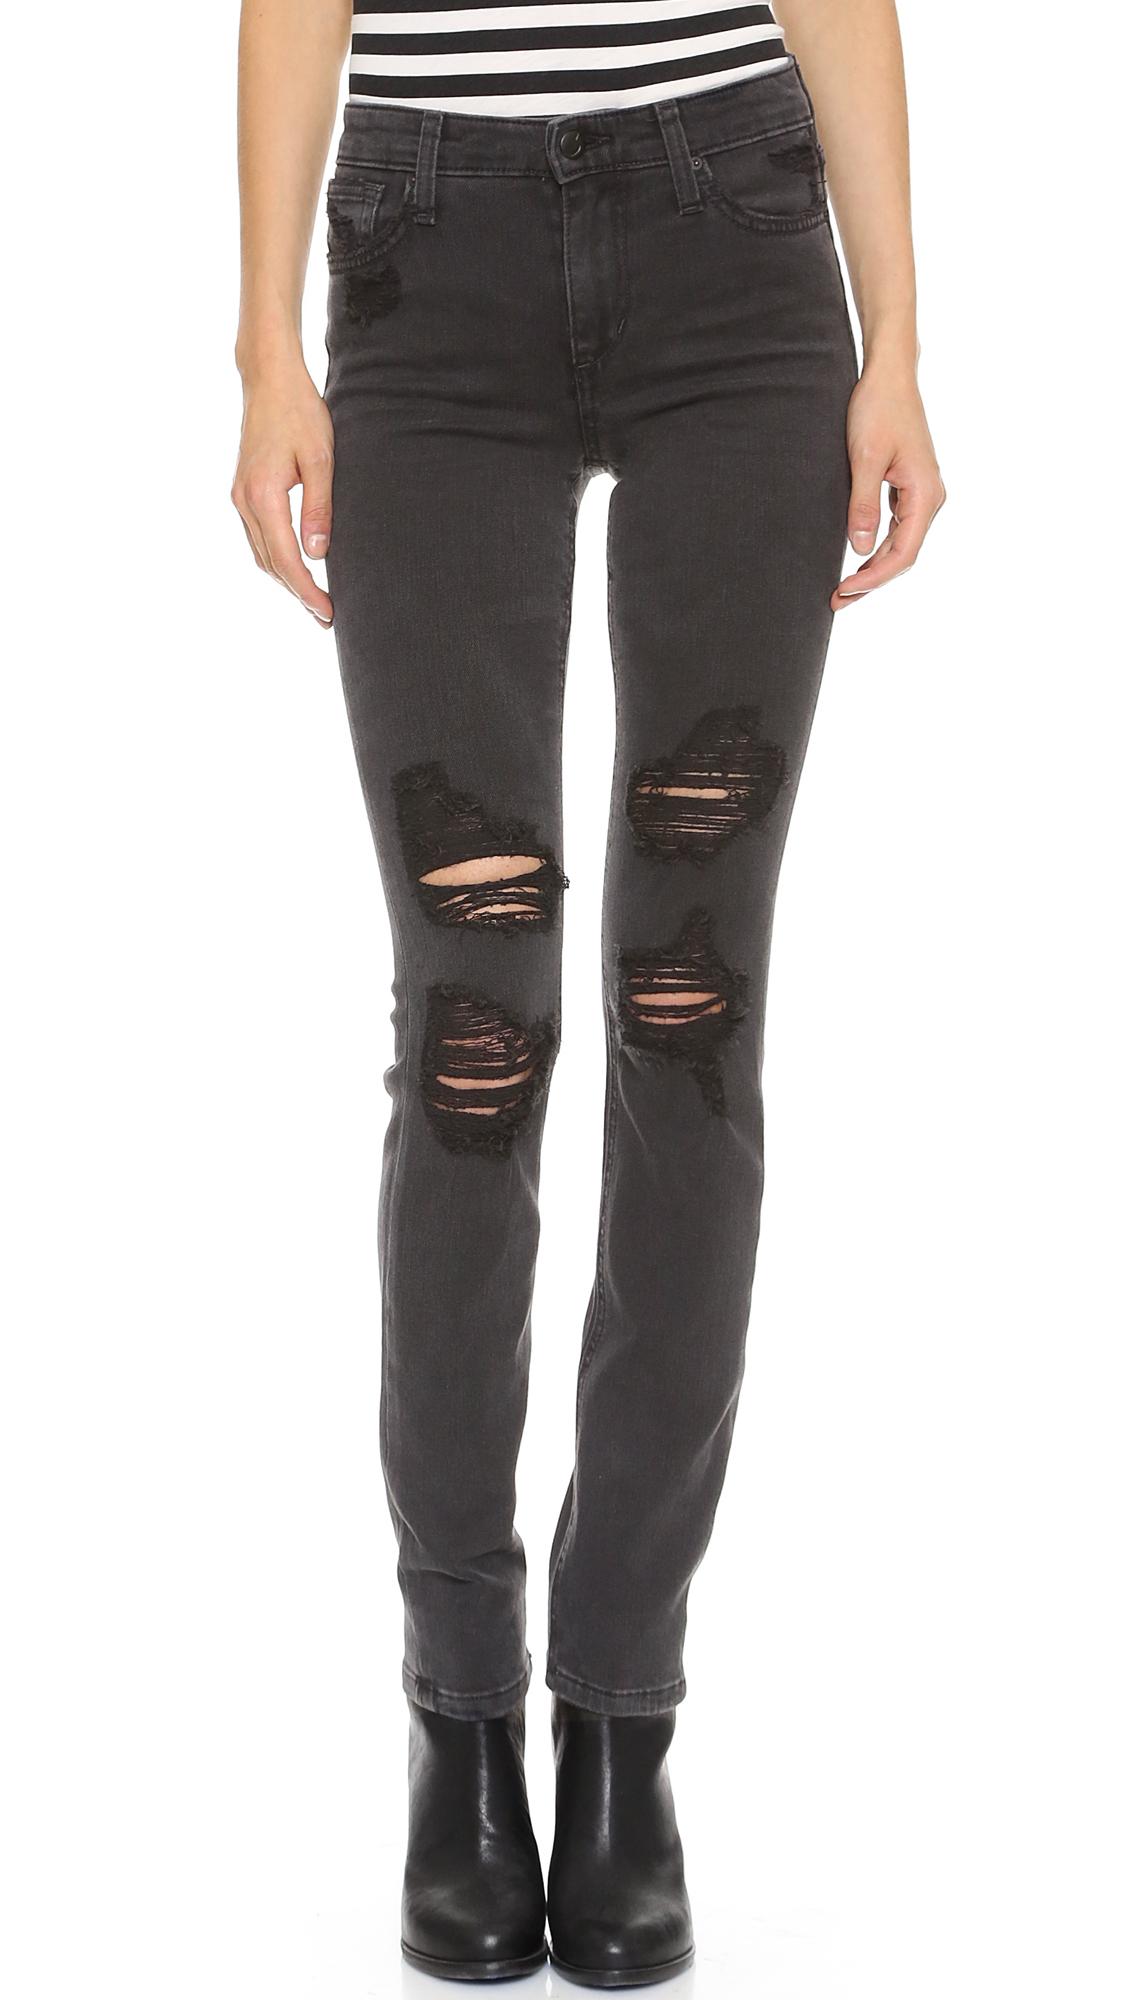 Joes Jeans High Rise Skinny Jeans Rhea In Gray Lyst